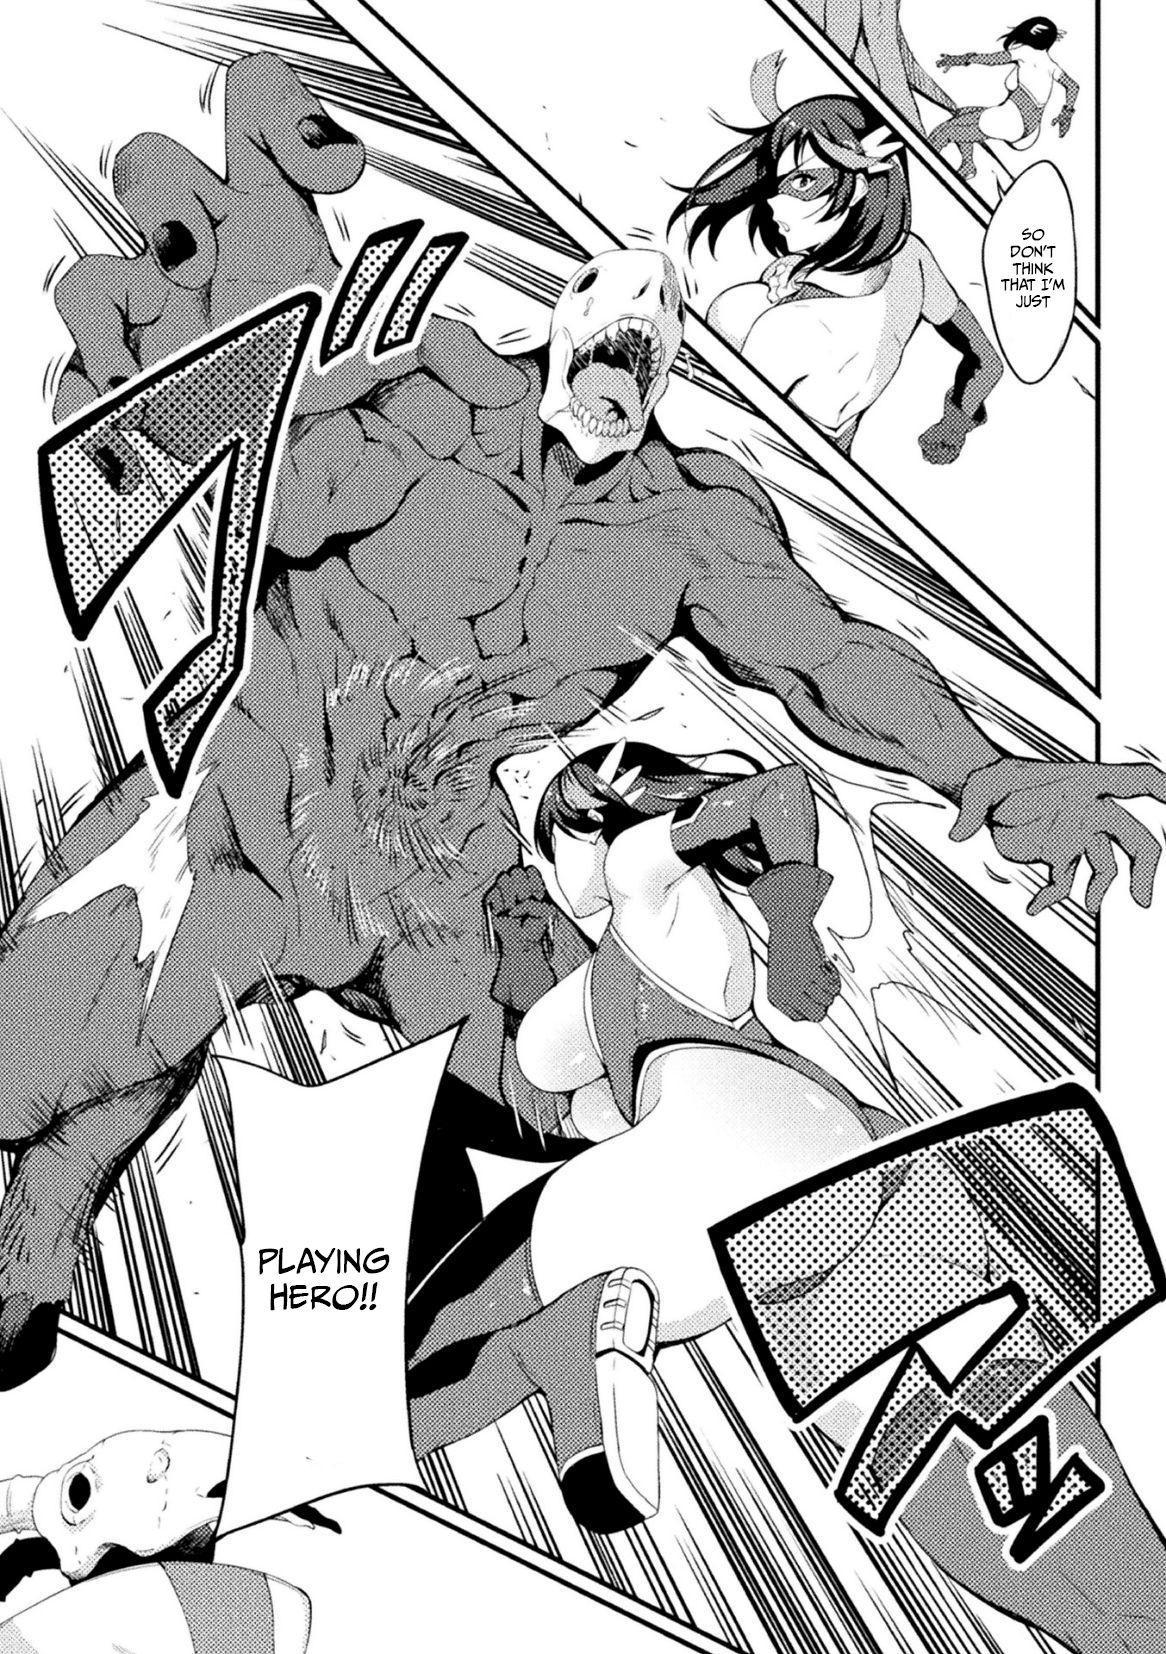 [Rinsun] Power Girl ~JK Super Heroine no Saiin Darakuki~ Ch. 2|Power Girl ~JK Super Heroine's Aphrodisiac Corruption Record~ Ch. 2 [English] [Neraka Translations] 8